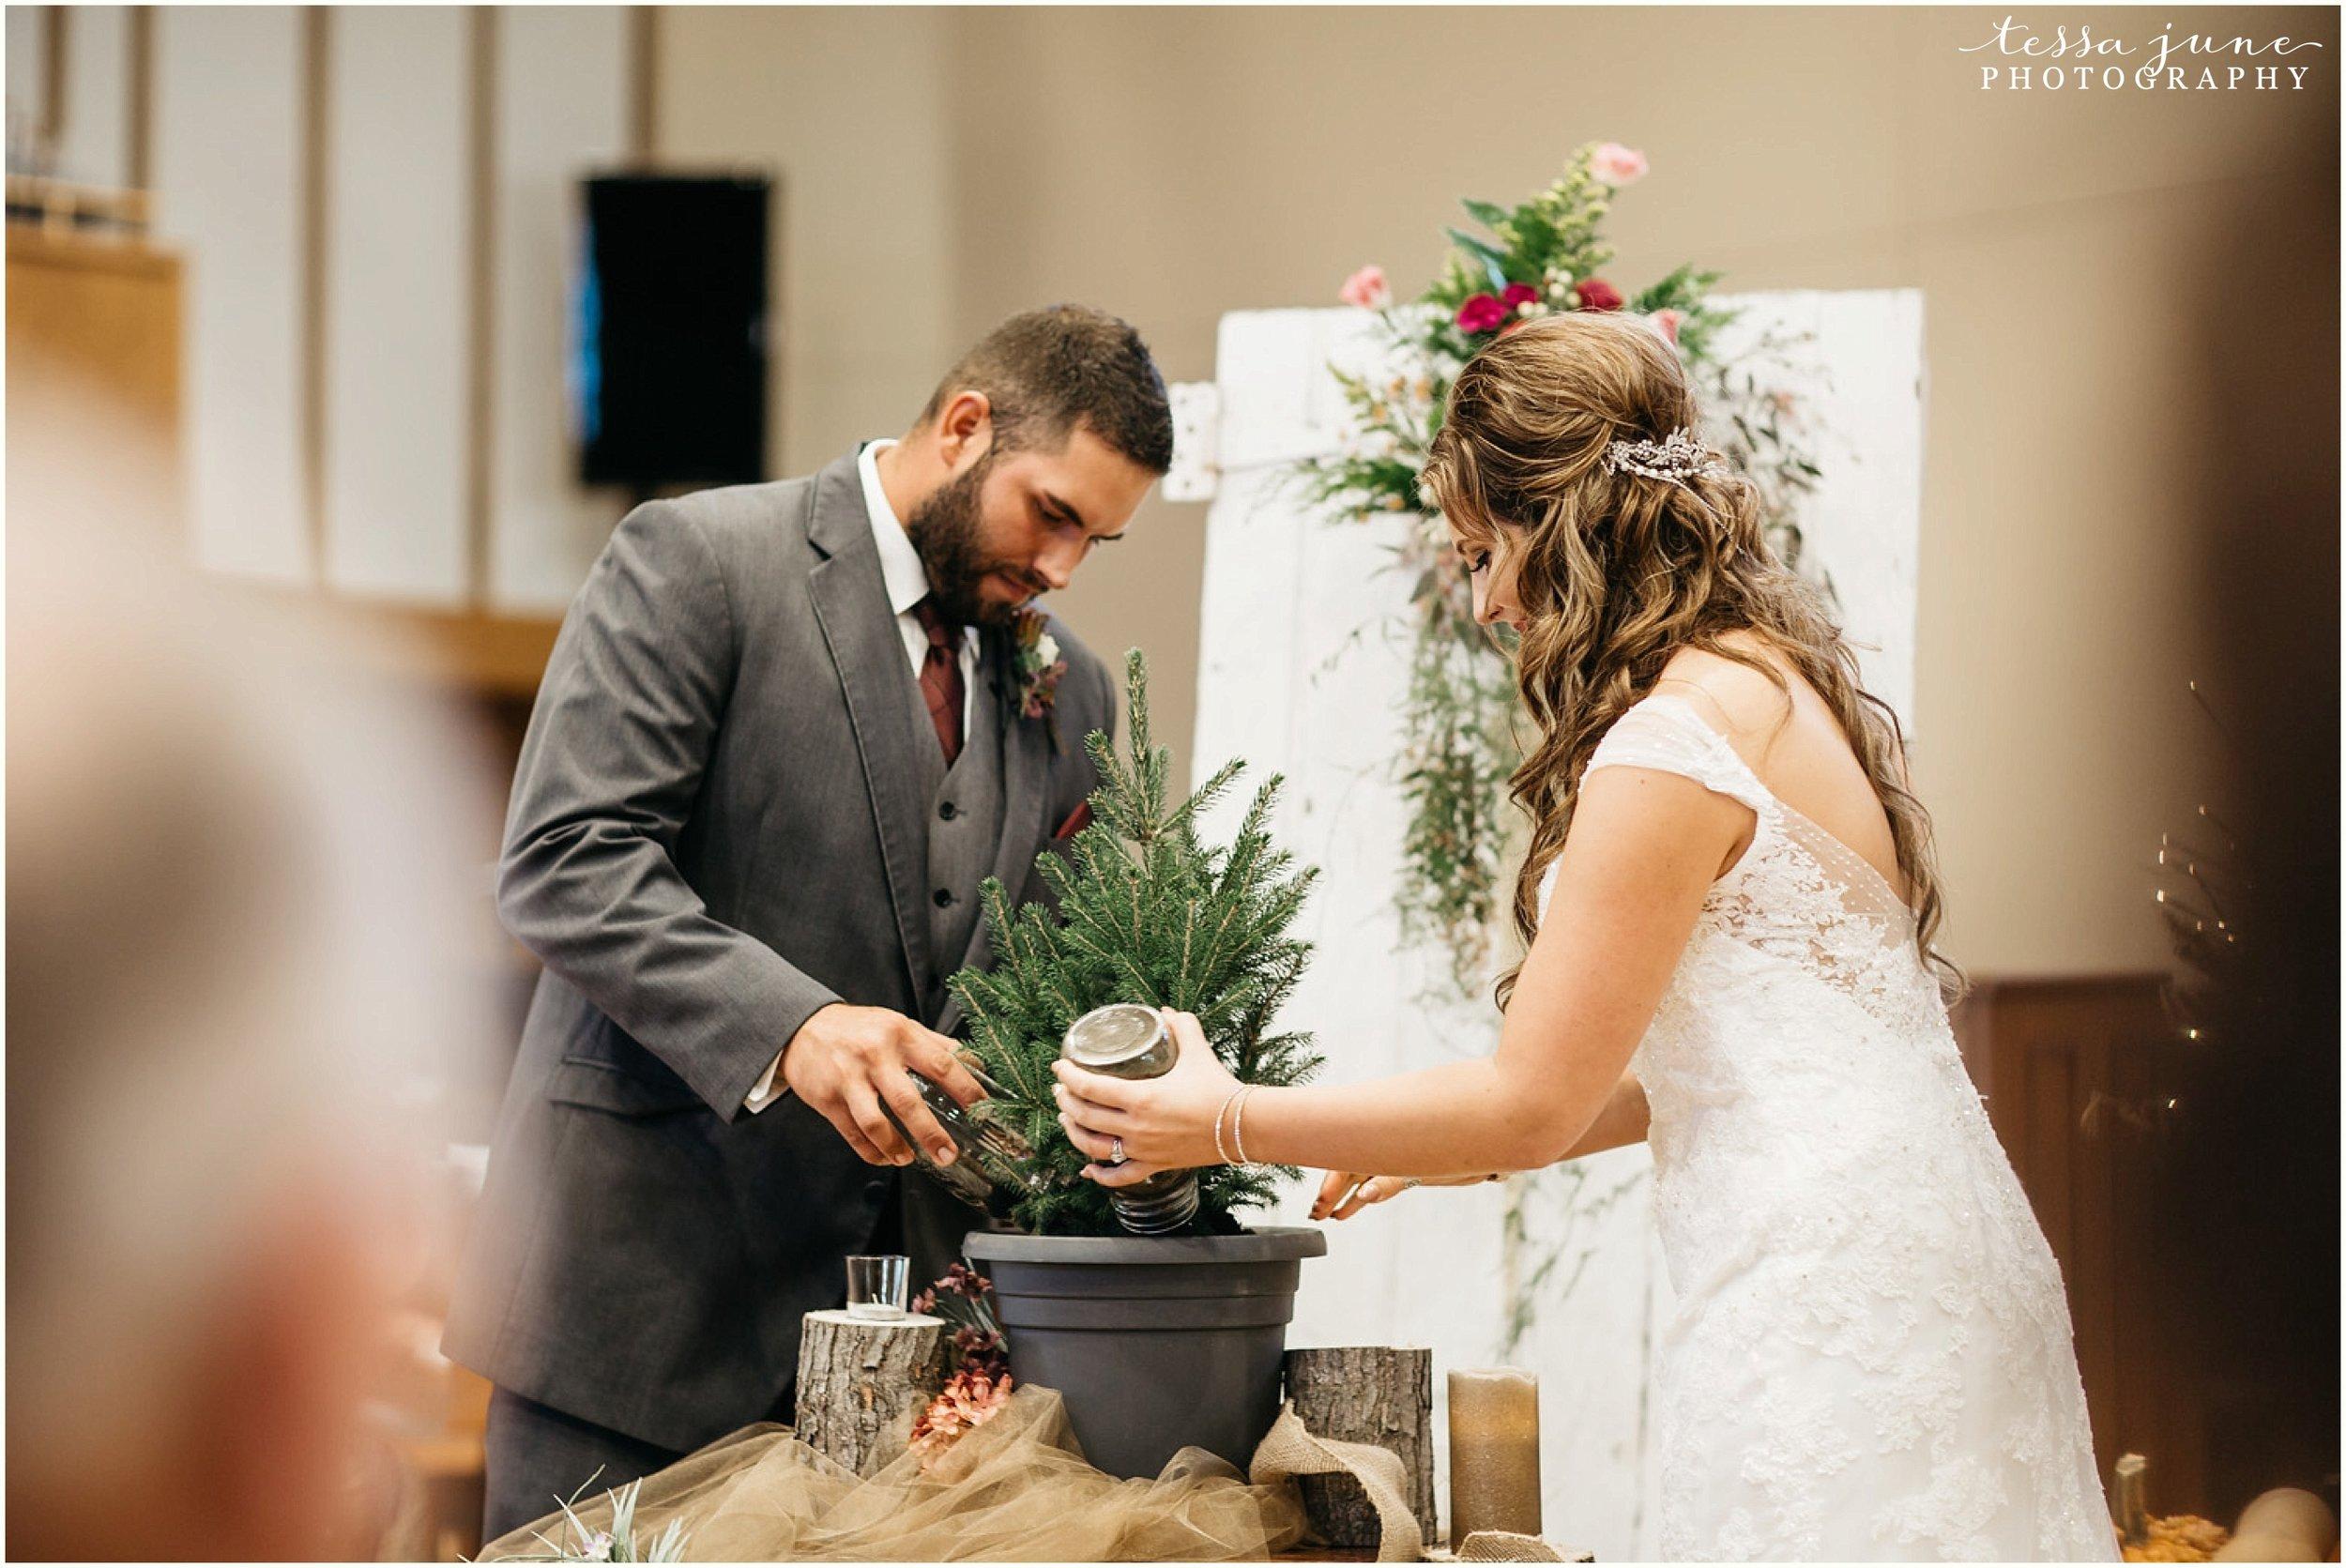 bohemian-minnesota-wedding-mismatched-bridesmaid-dresses-waterfall-st-cloud-tessa-june-photography-114.jpg